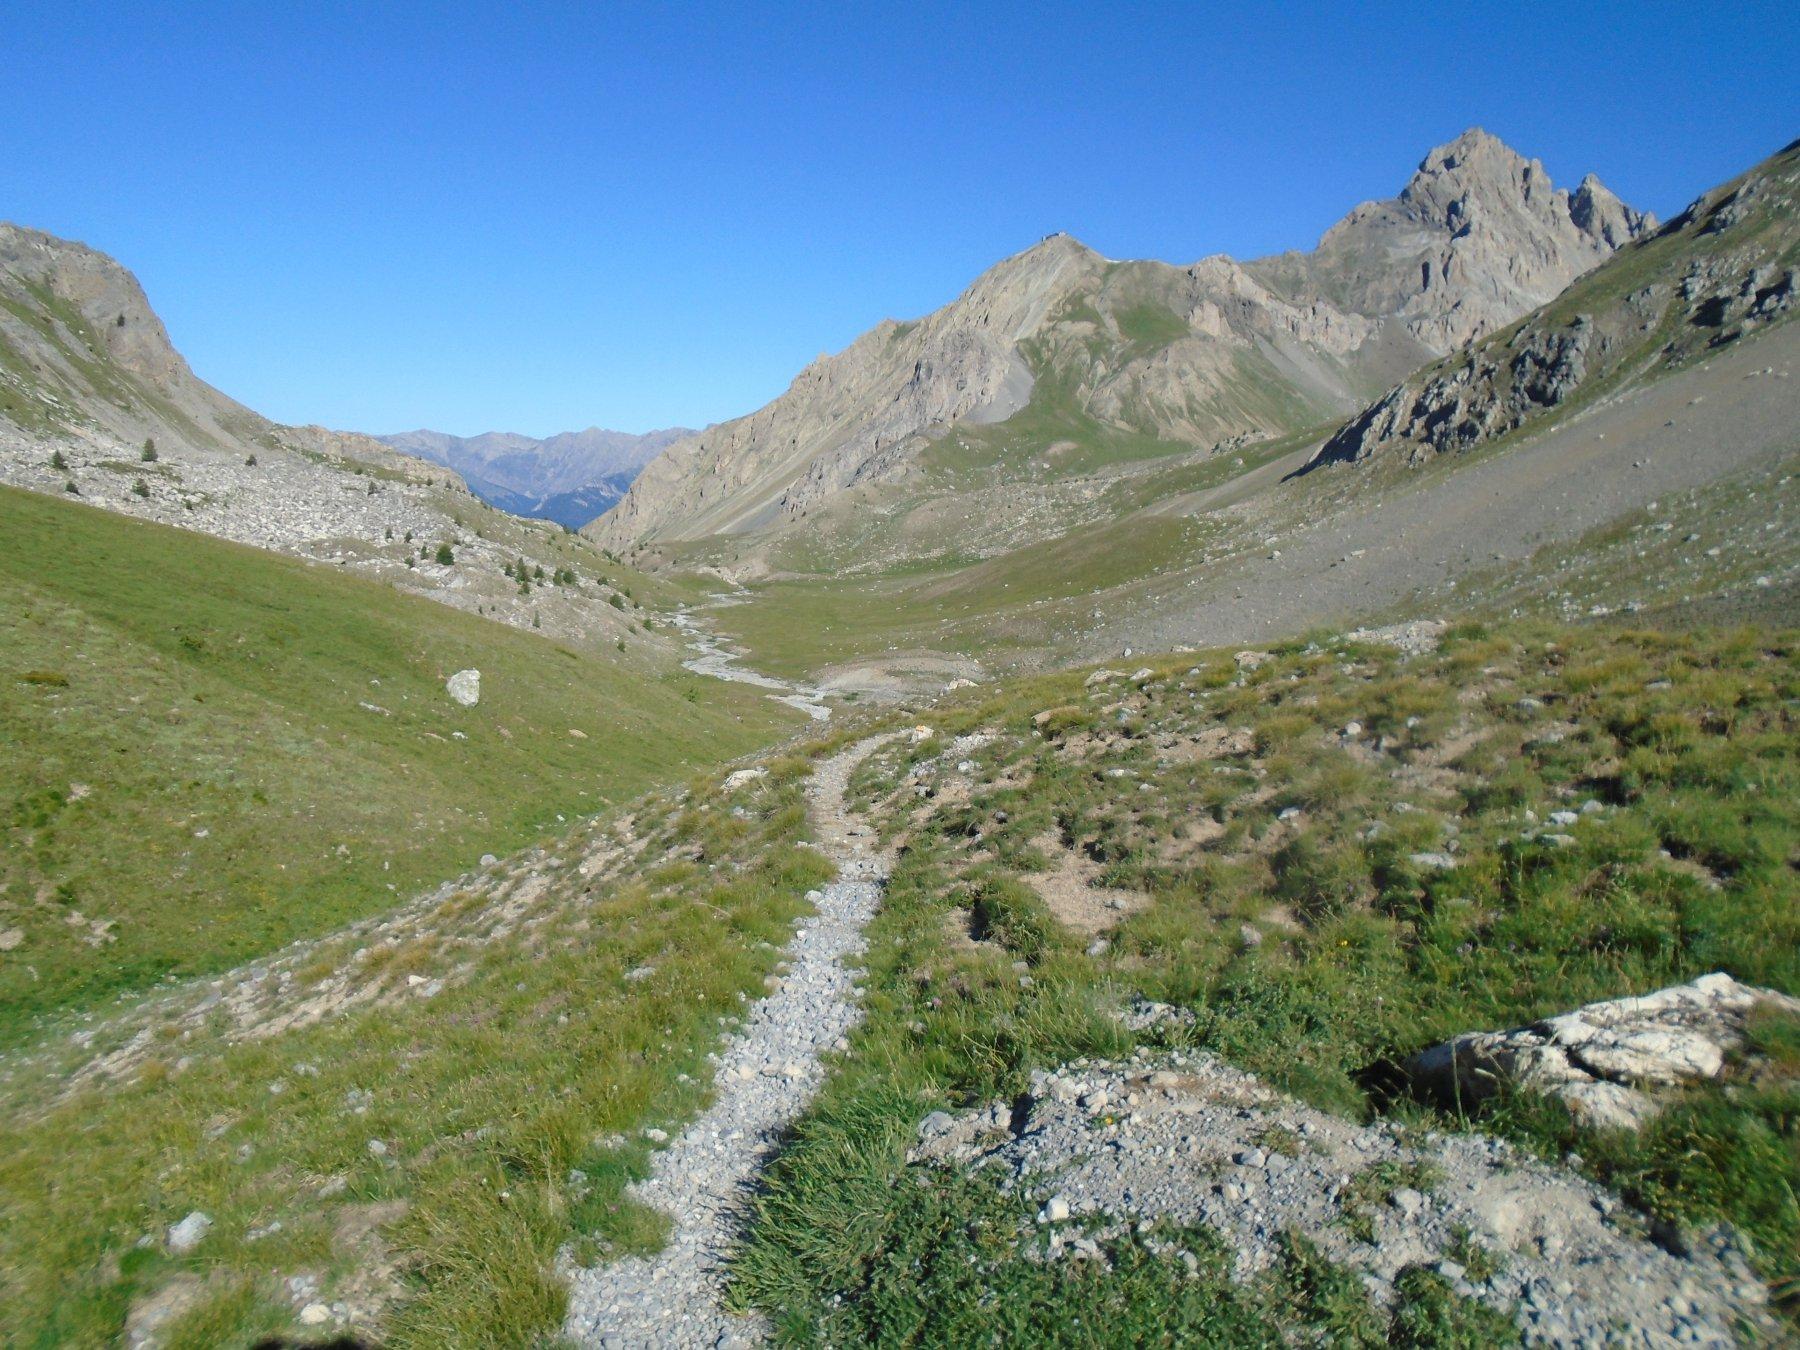 L' altipiano percorso e vista su Batterie de Viraysse e Meyna